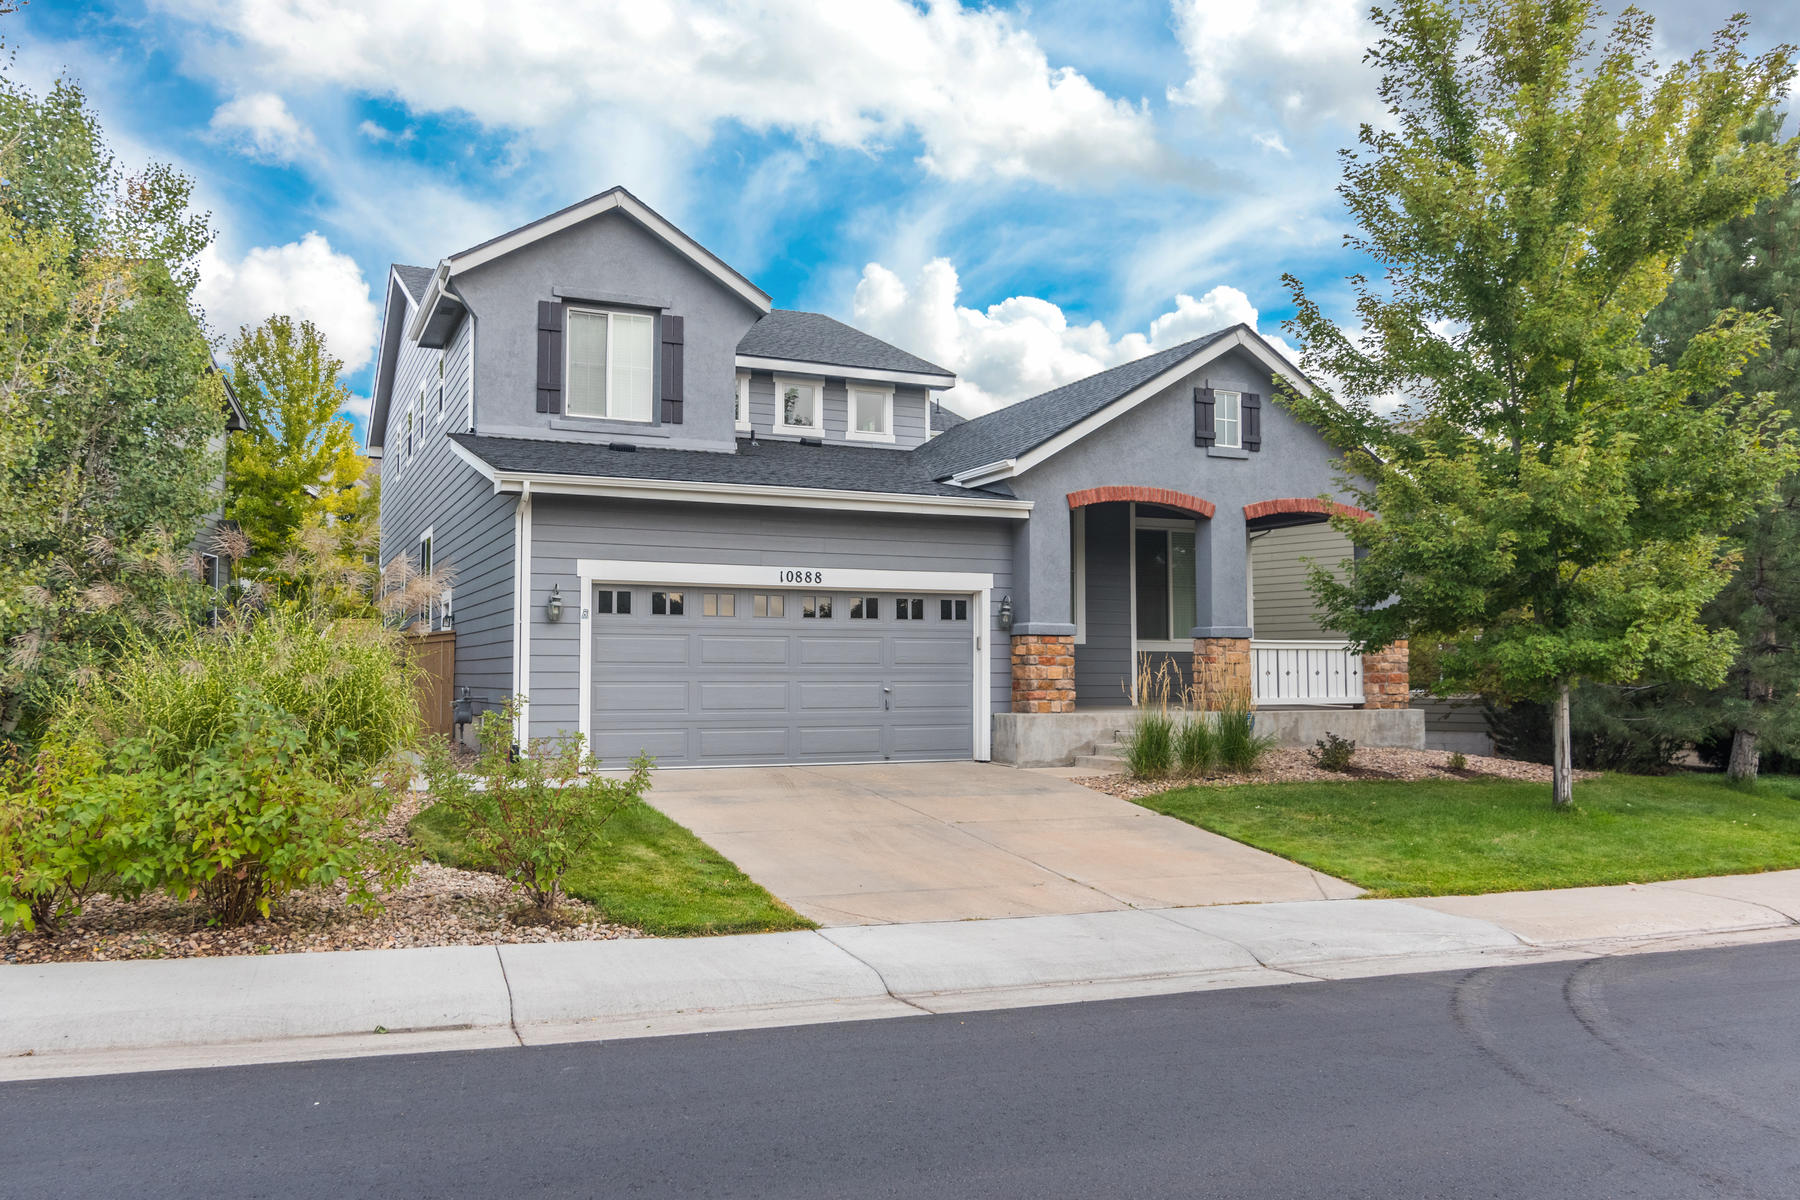 Single Family Homes 为 销售 在 A popular floor plan in Firelight 10888 Oakshire Ave 伊恩和高原牧场, 科罗拉多州 80126 美国